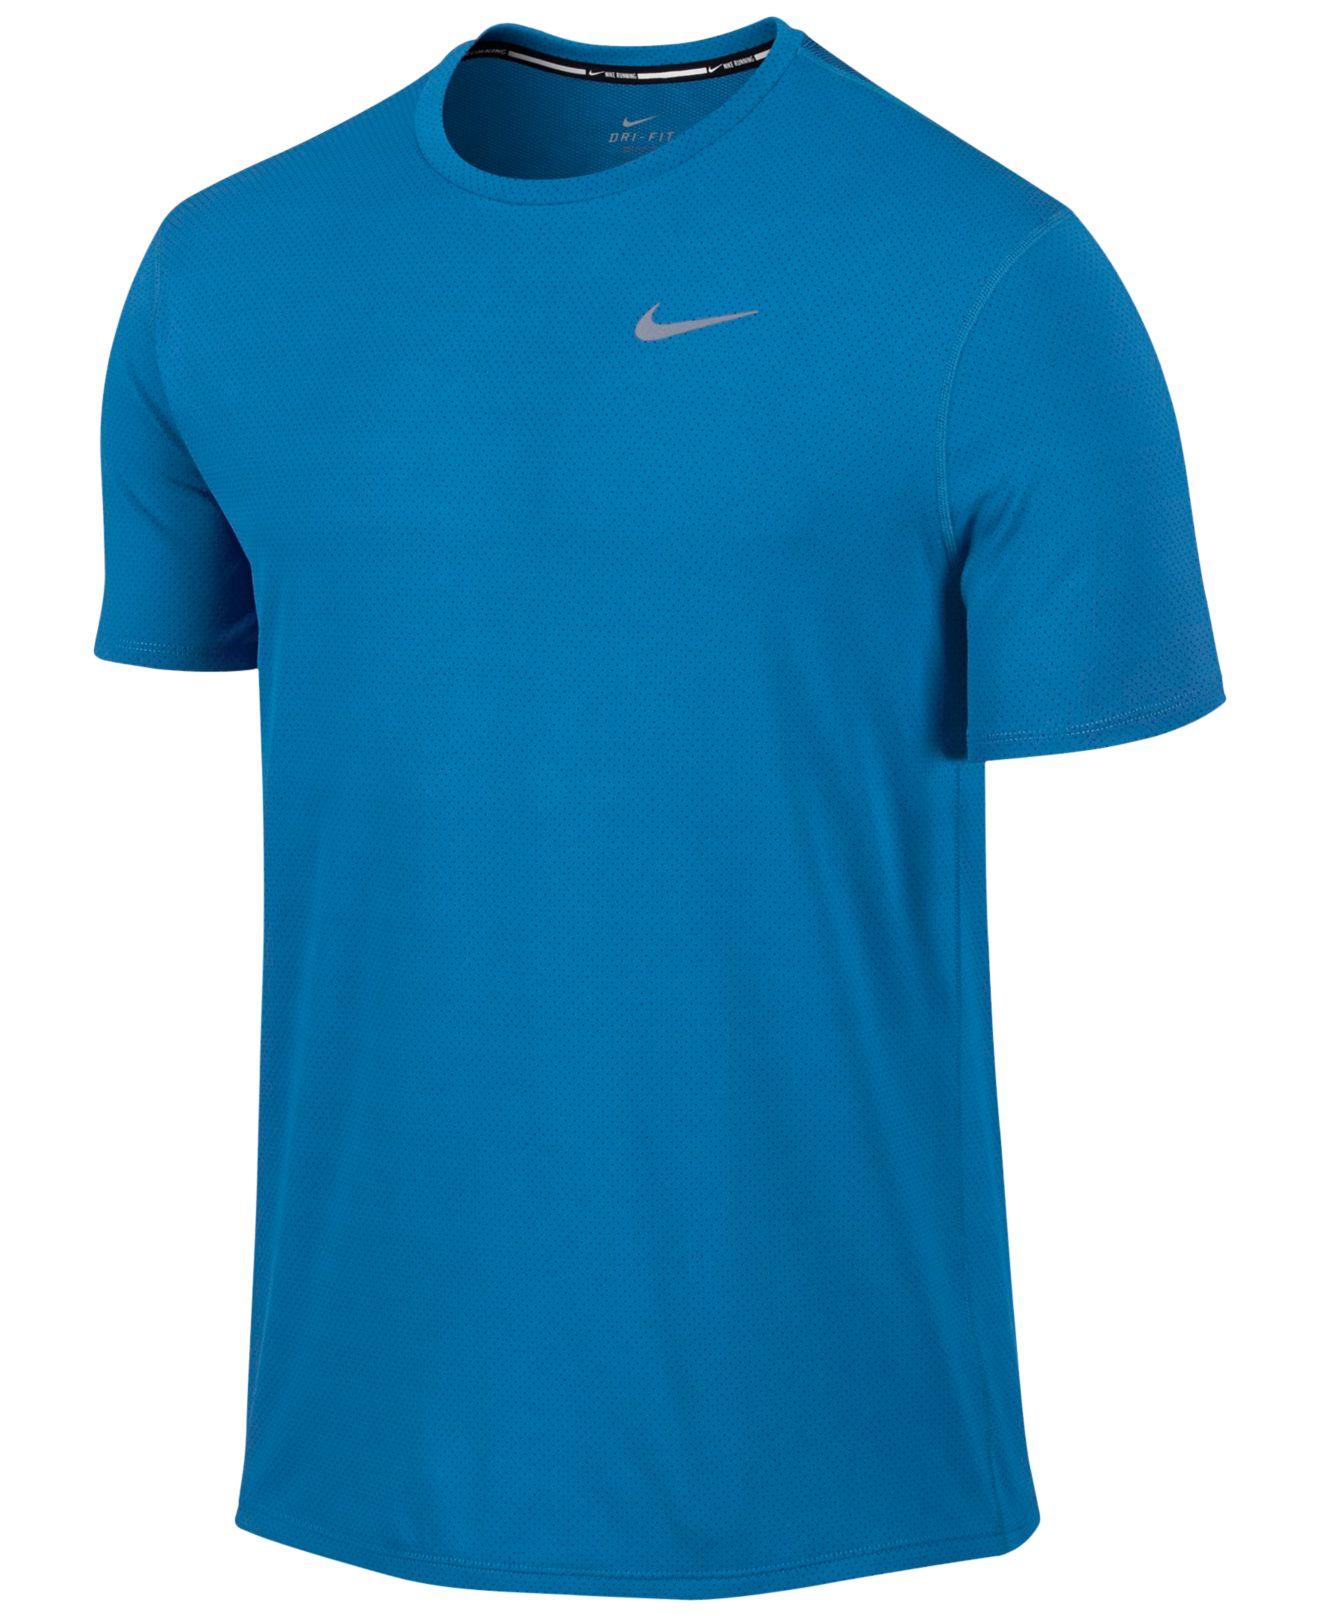 Anlis Running Fit Dri Nike Shirt xR1YqCv